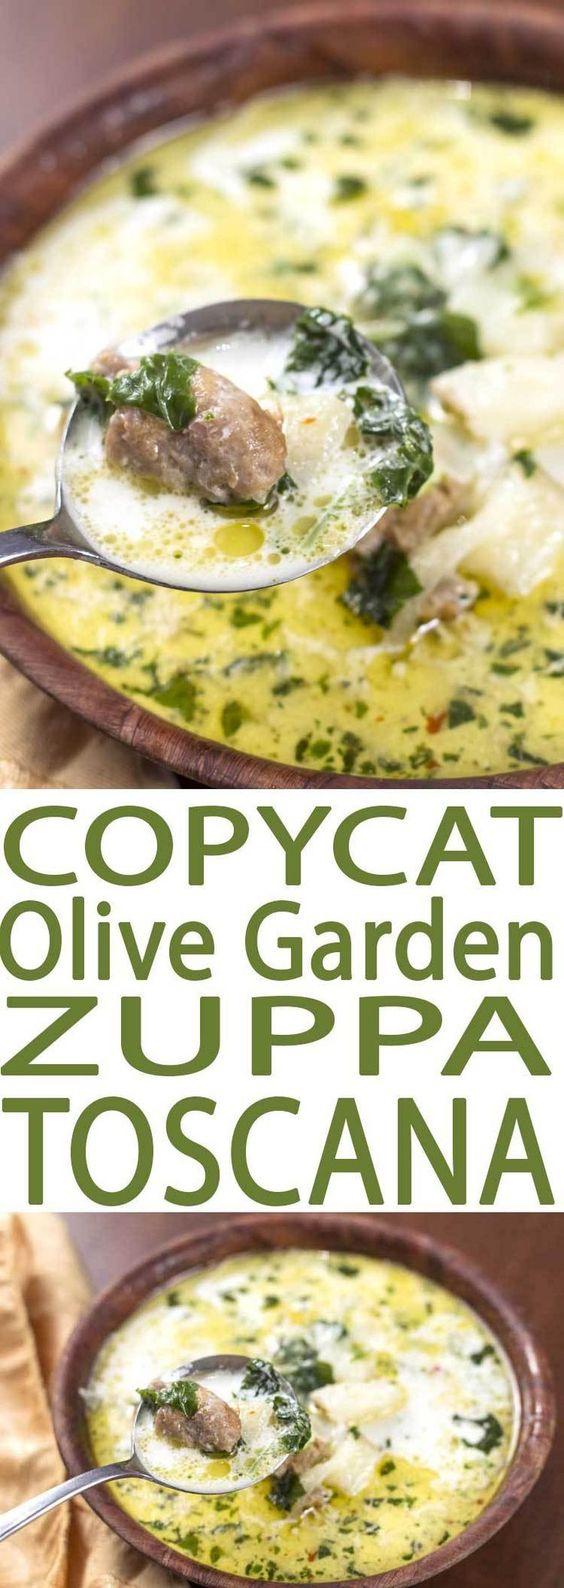 Copycat olive garden zuppa toscana soup recipe - Recipe for olive garden zuppa toscana ...